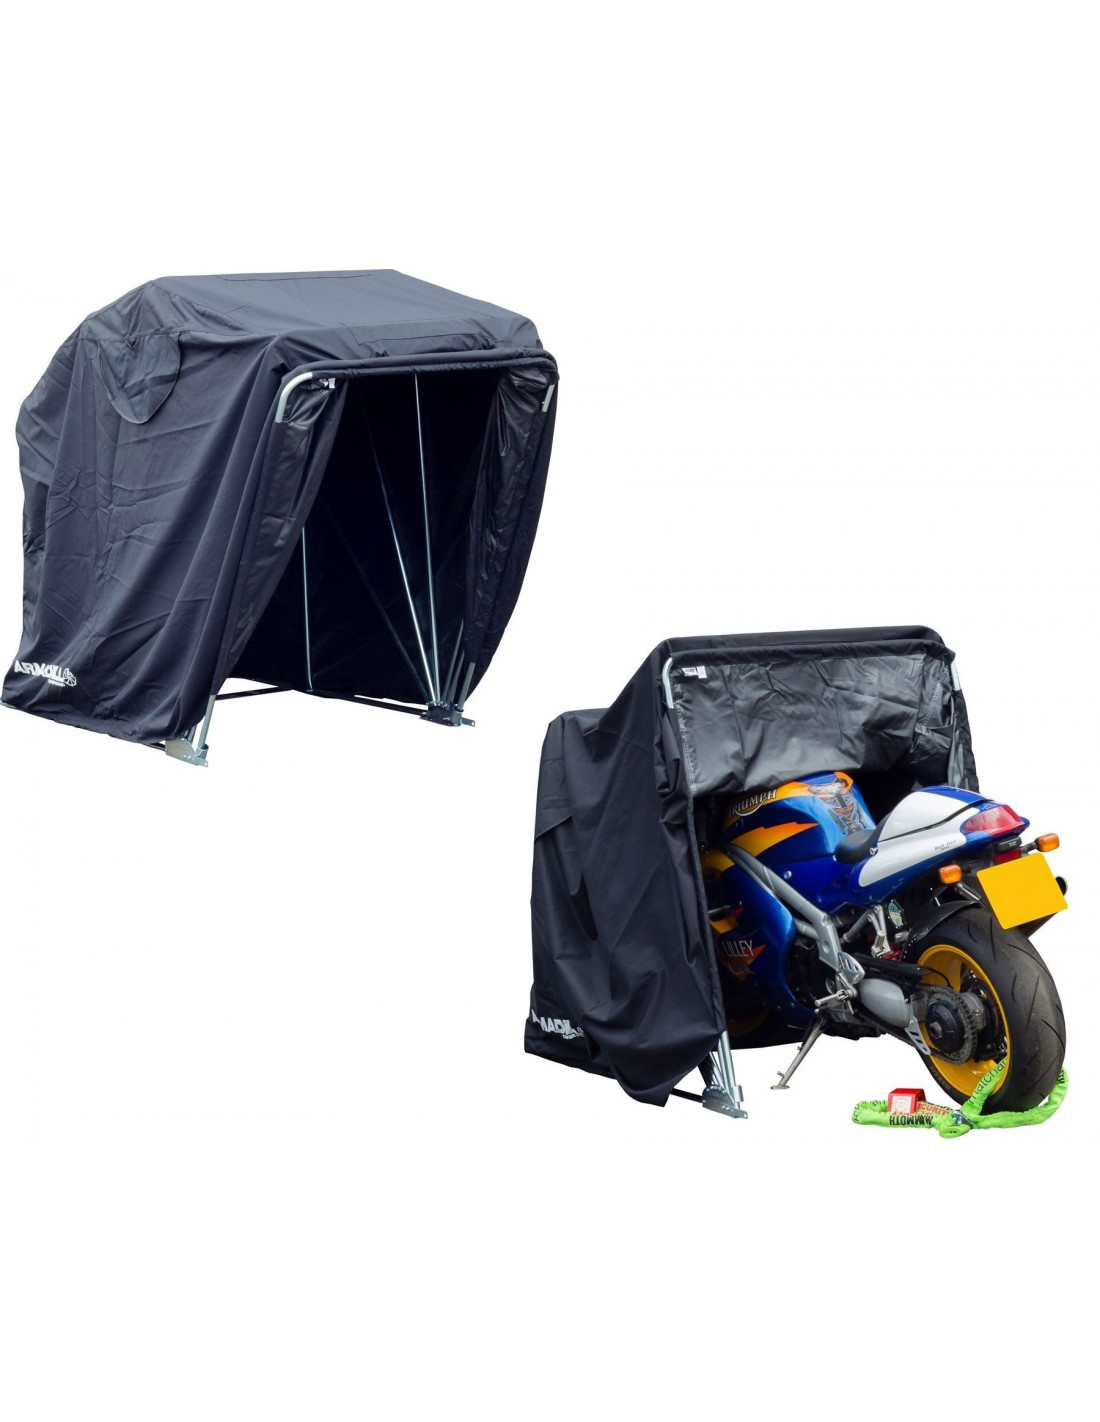 garaje portatil moto similar acebikes tamaÑo normal garaje para moto